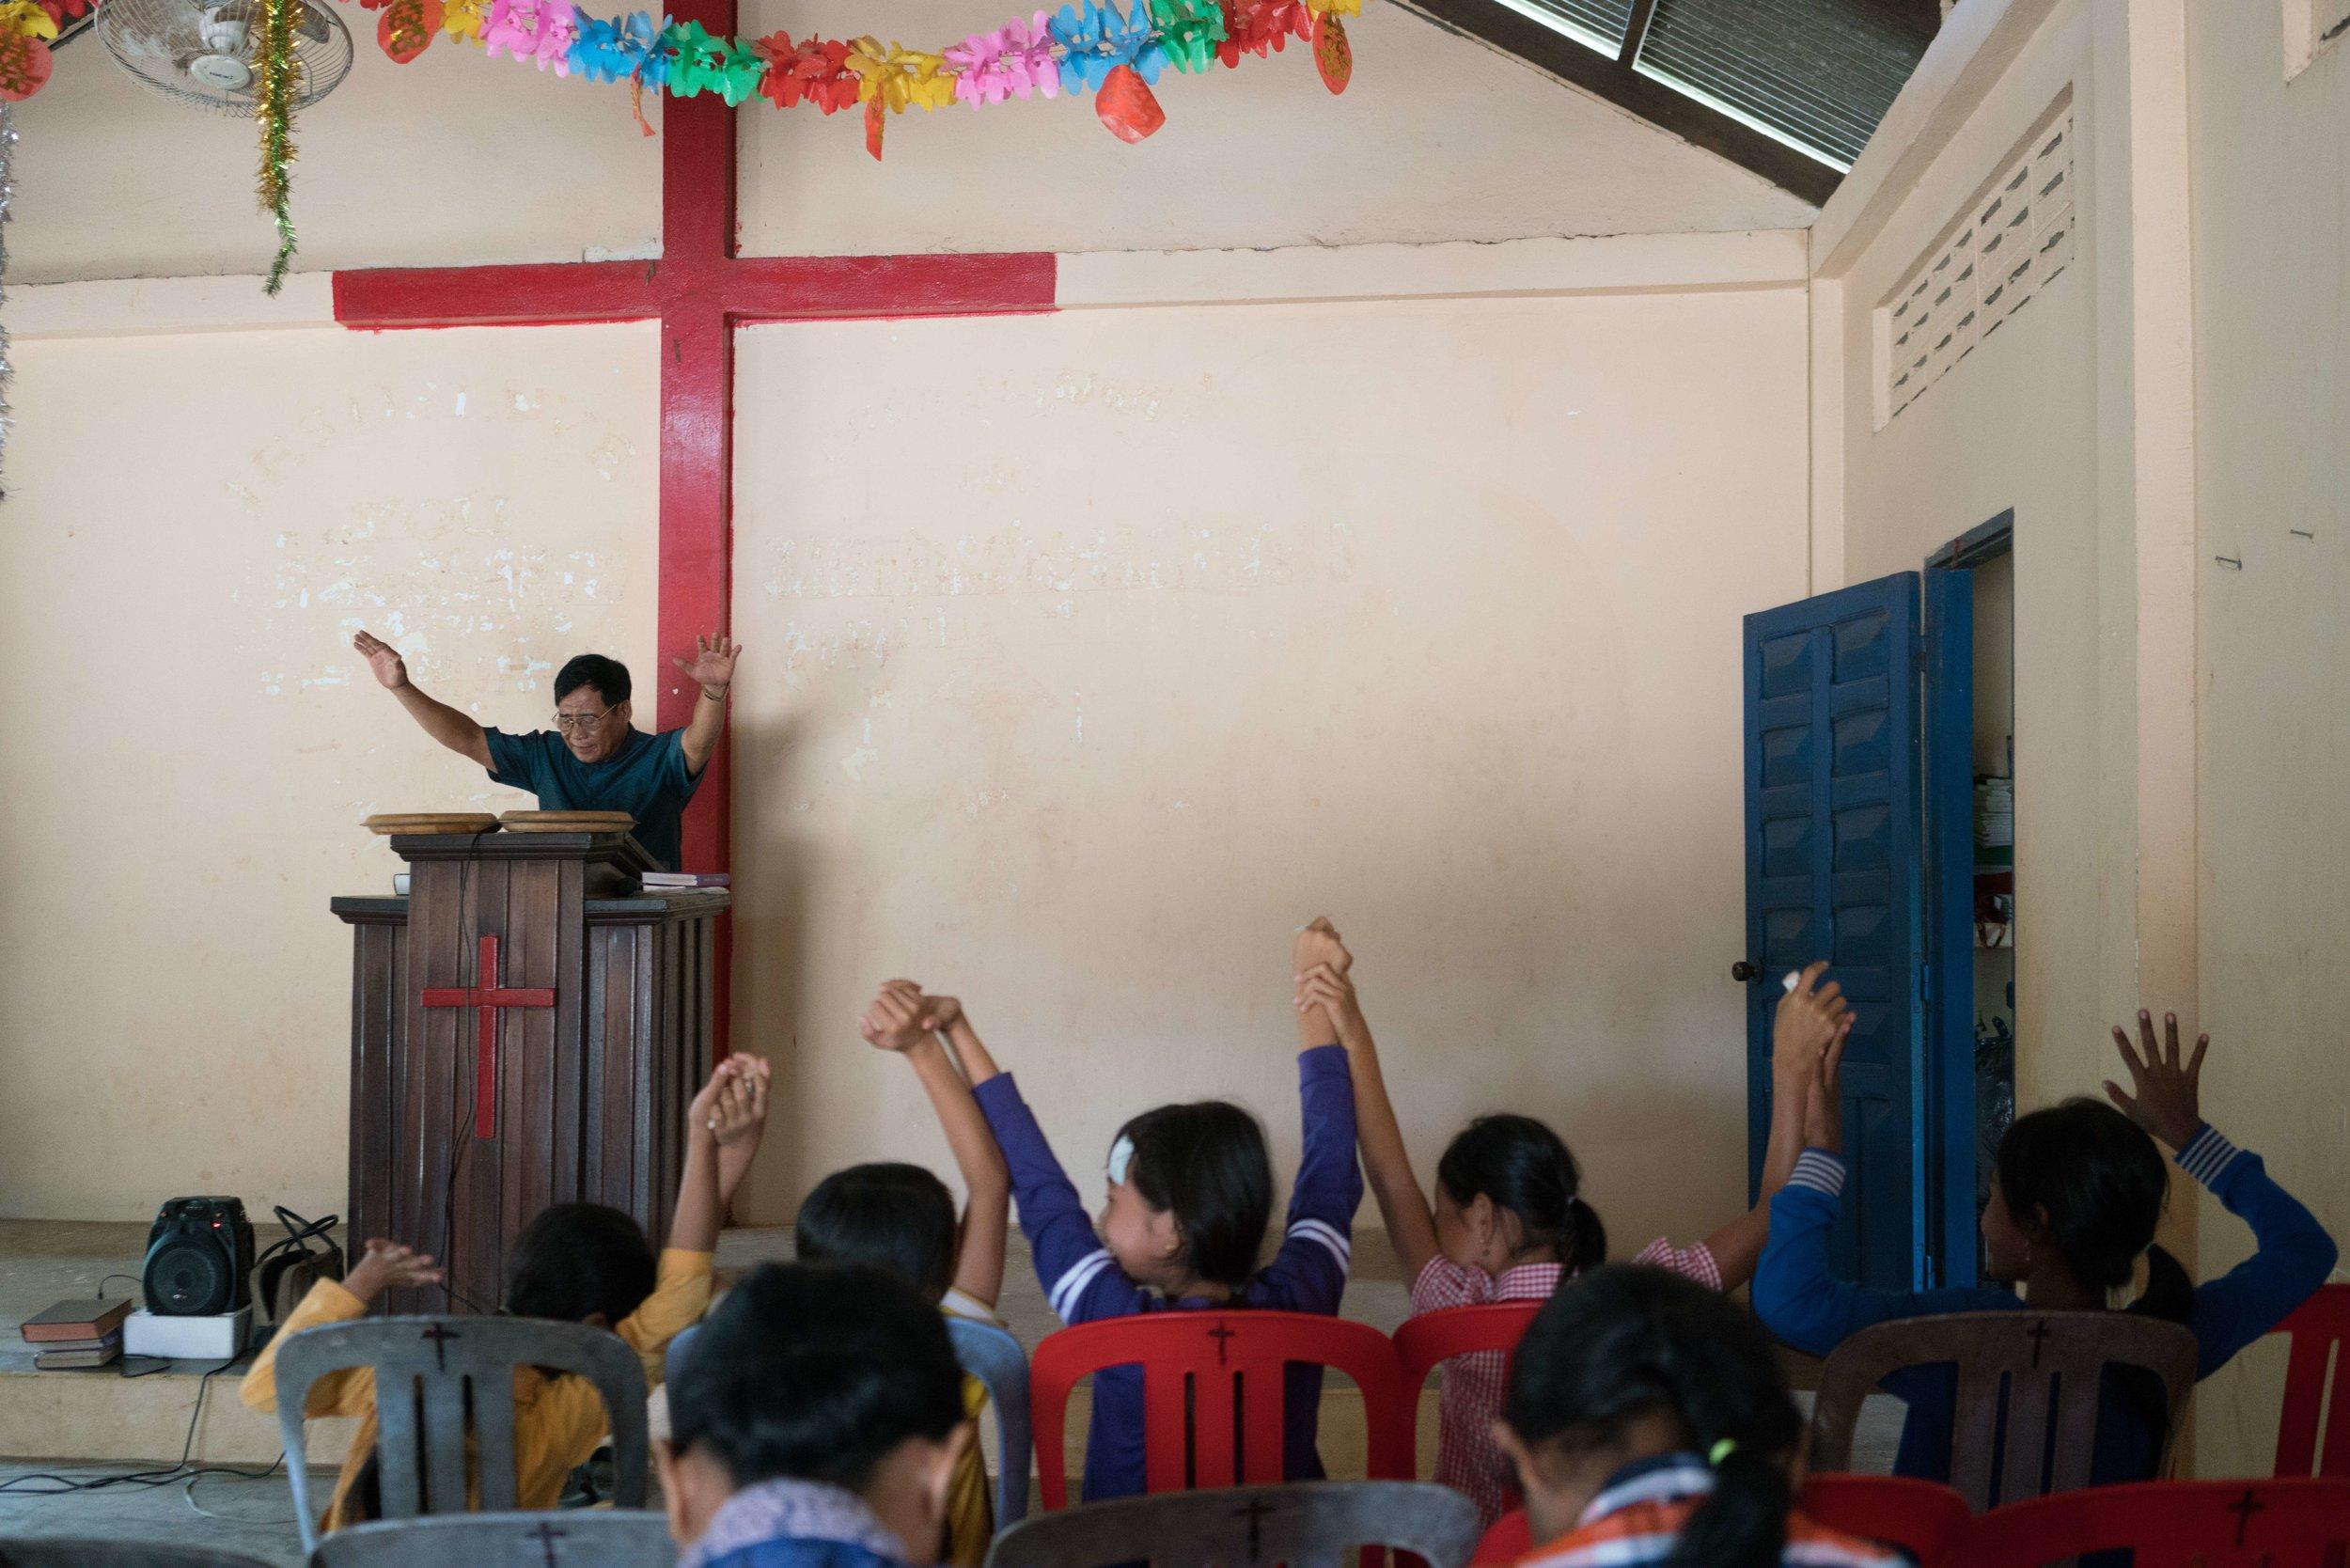 Ing Sophat address his congregation at a Khum O Presbyterian Church Sunday service. (Credit: Thomas Cristofoletti)